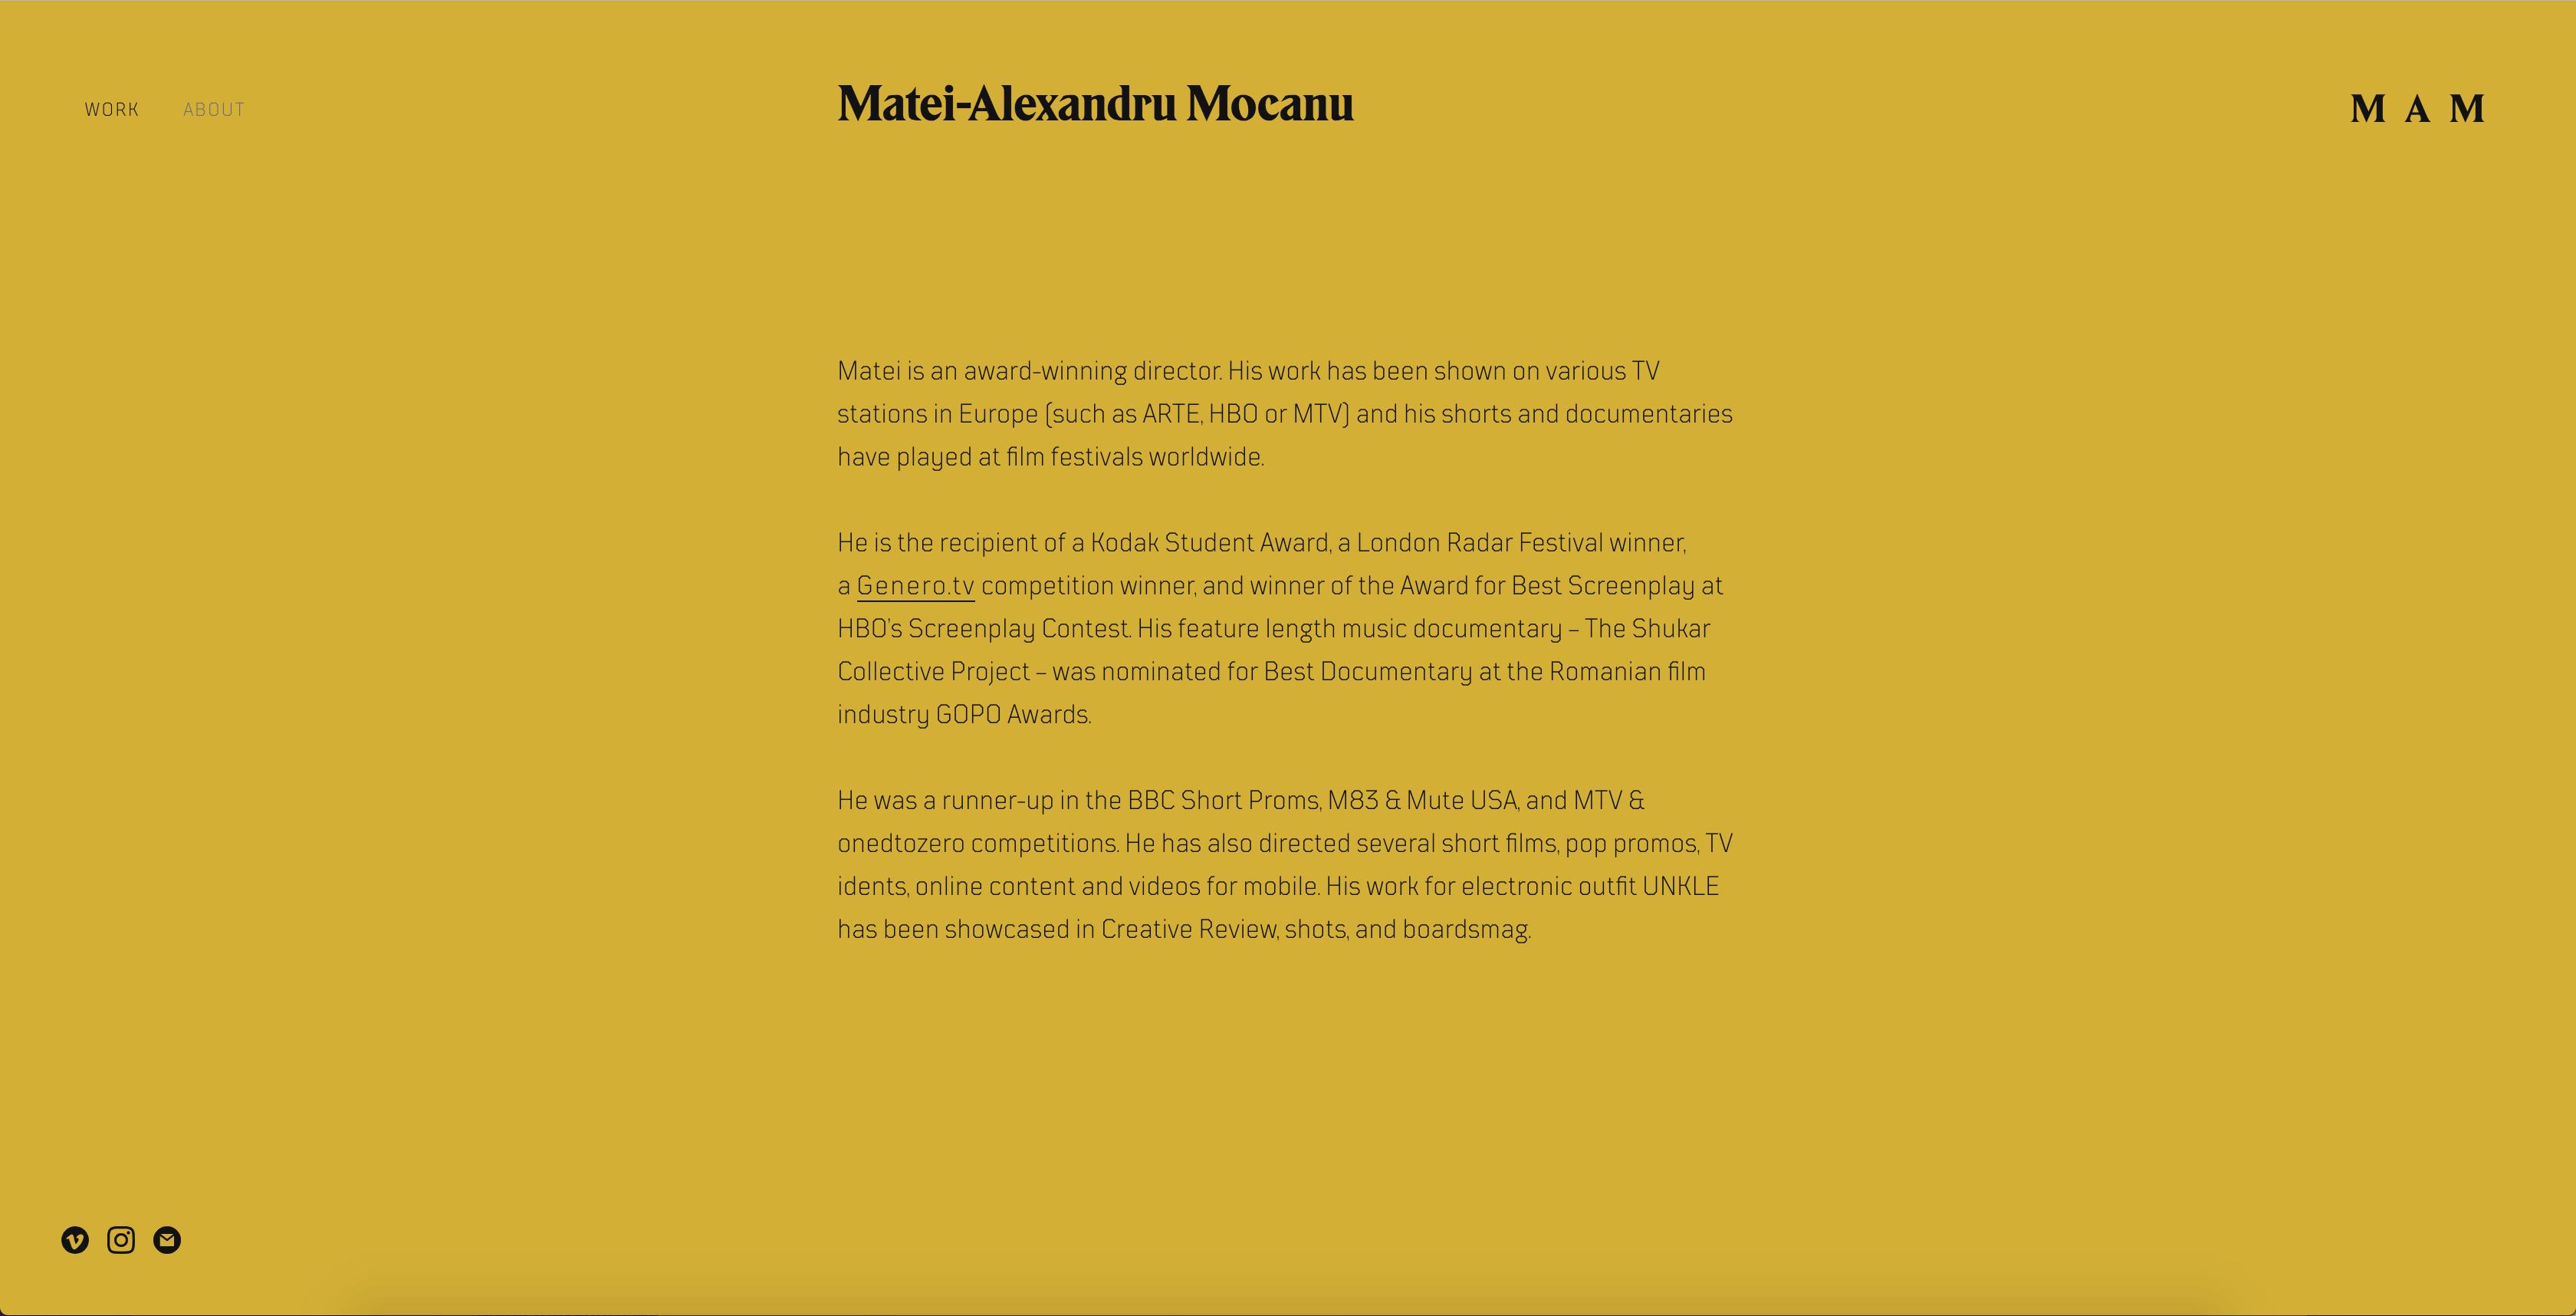 Matei Alexandru Mocanu